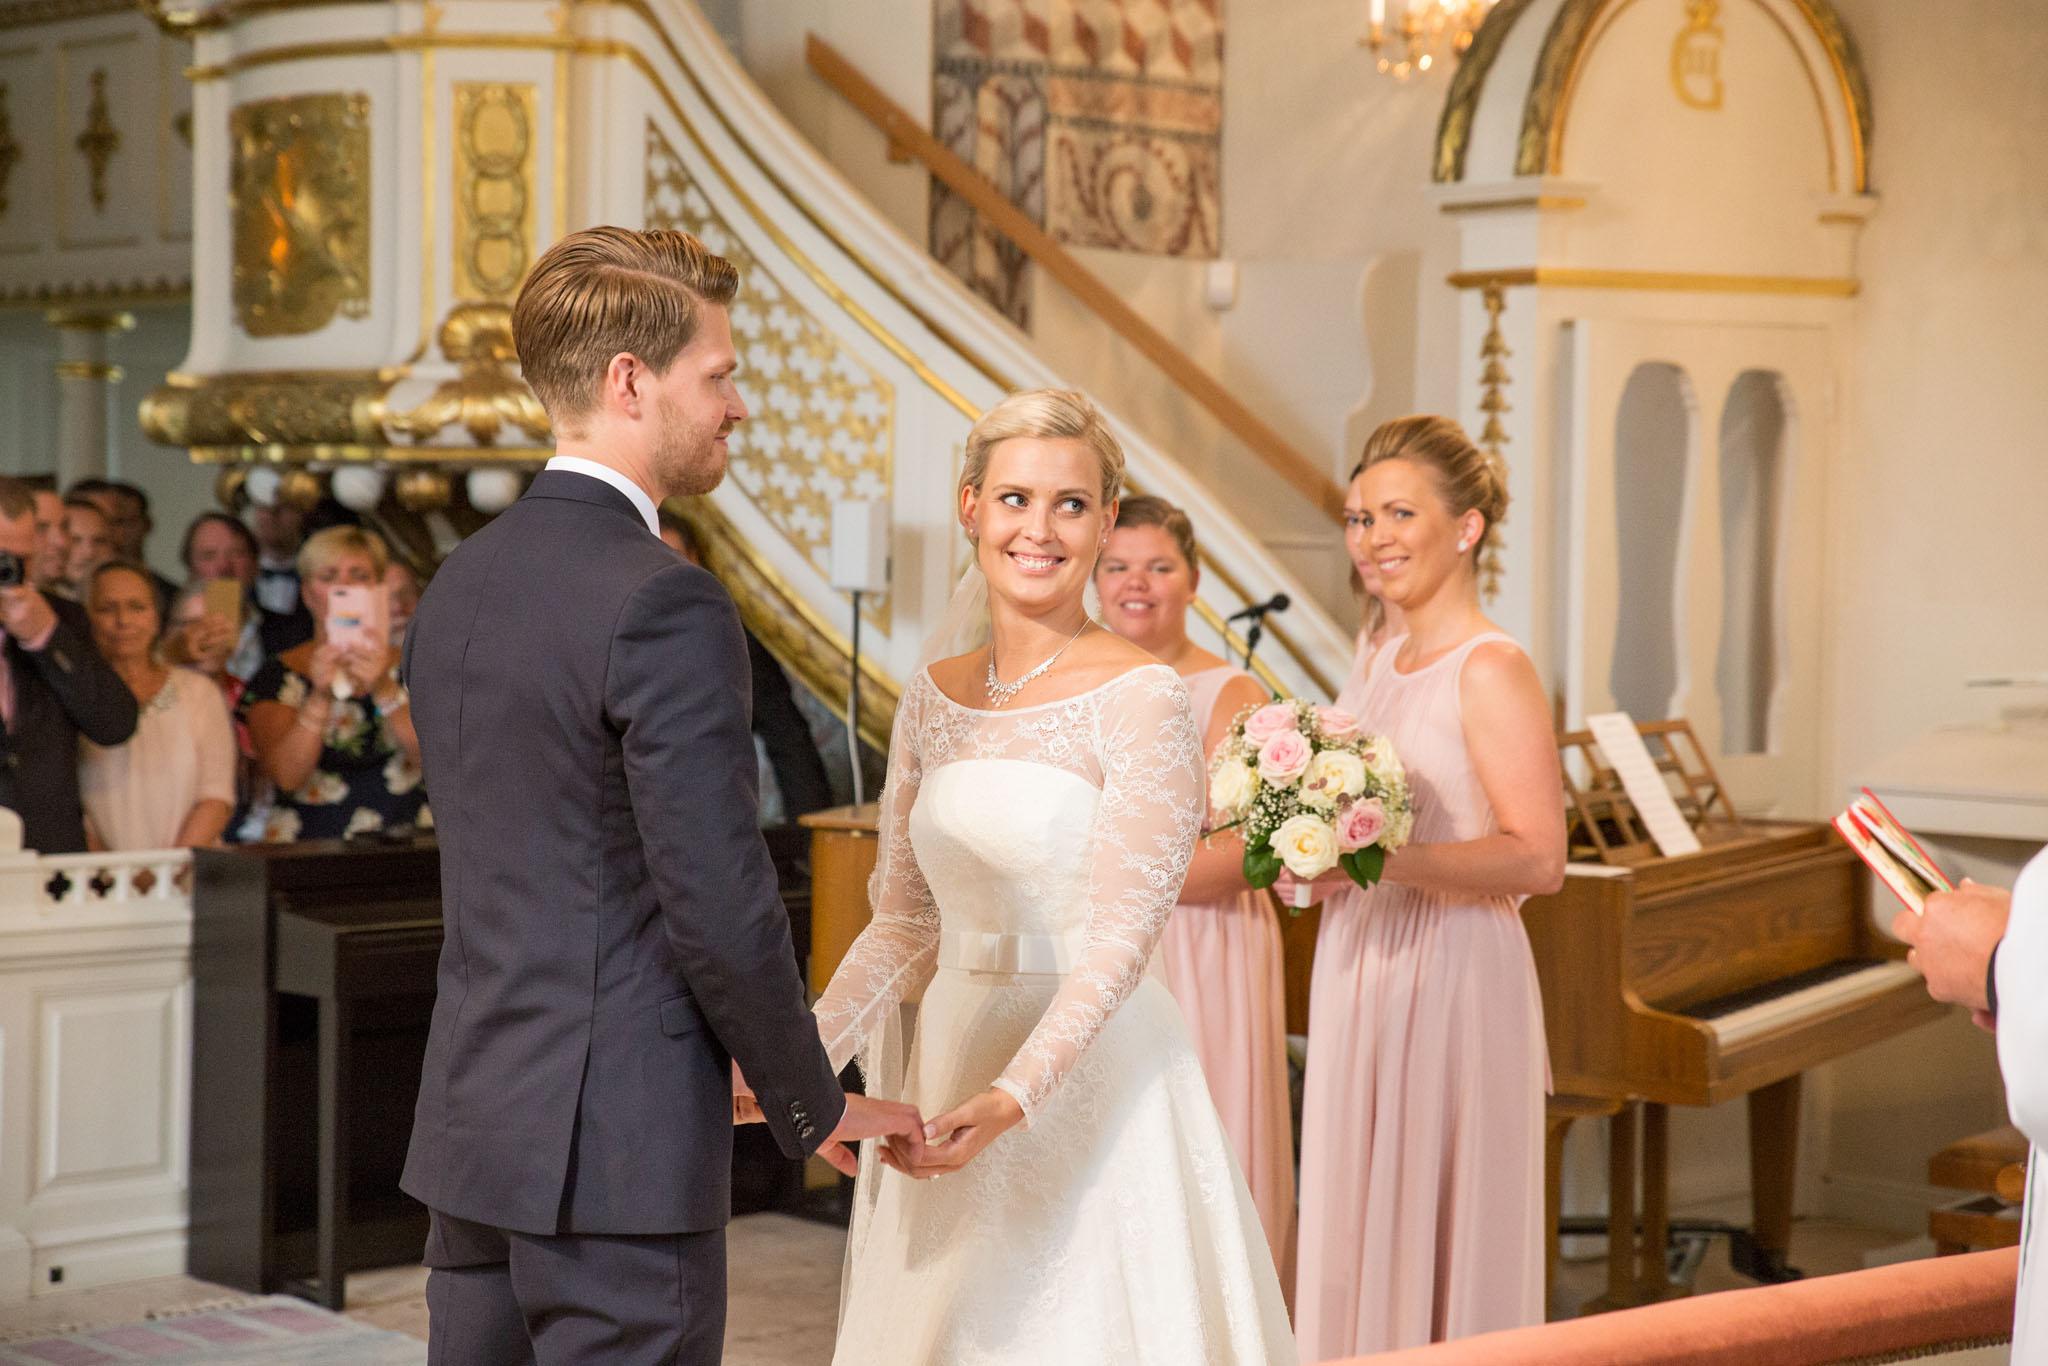 fotograf sabina wixner hudiksvall bröllop 5.jpg